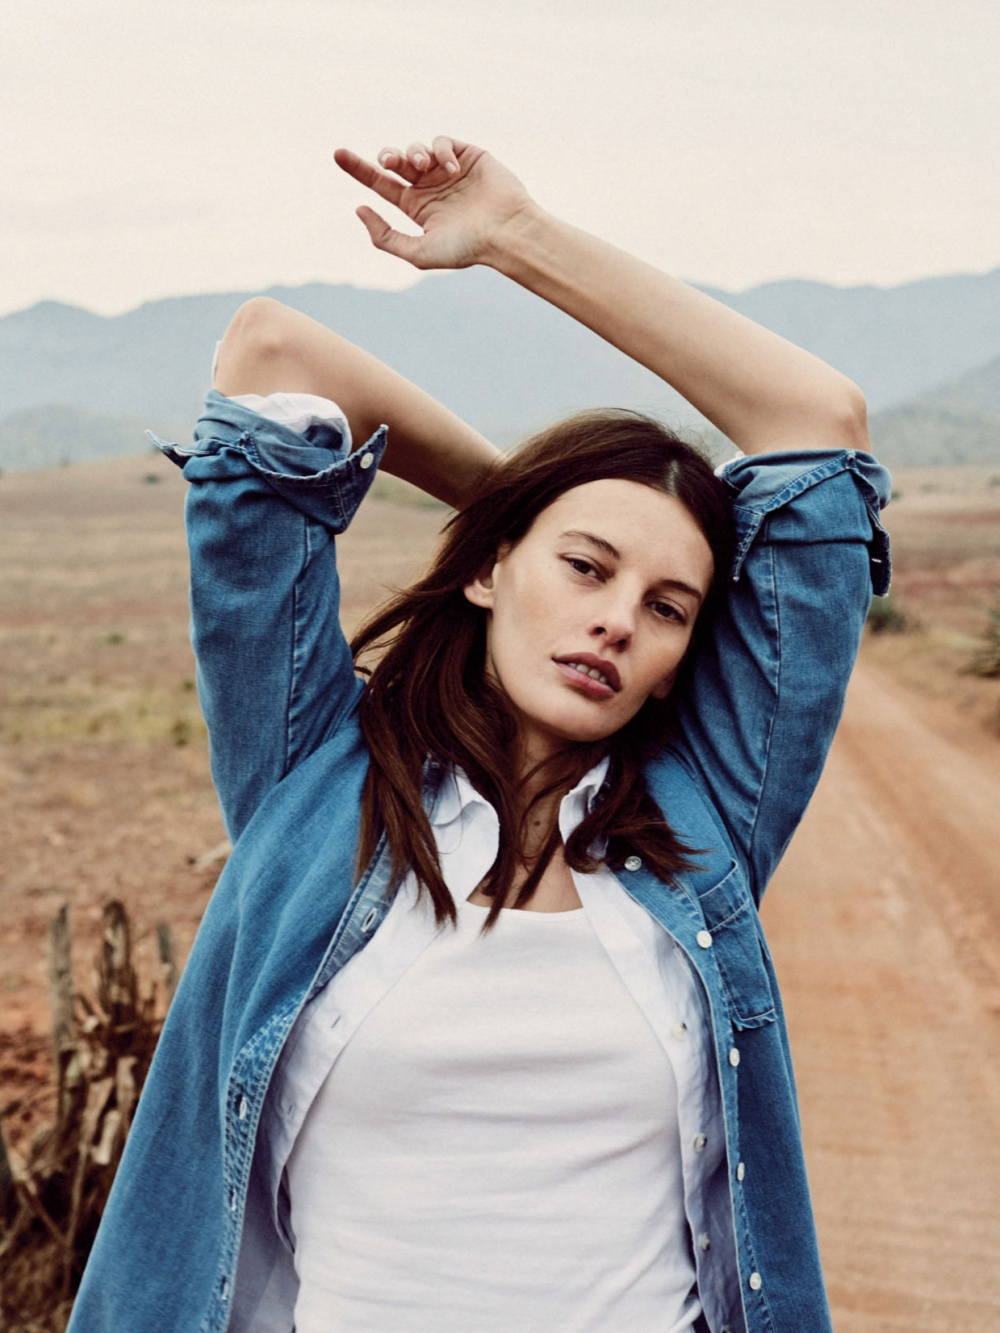 Amanda Murphy By Quentin De Briey For Vogue Uk May 2016